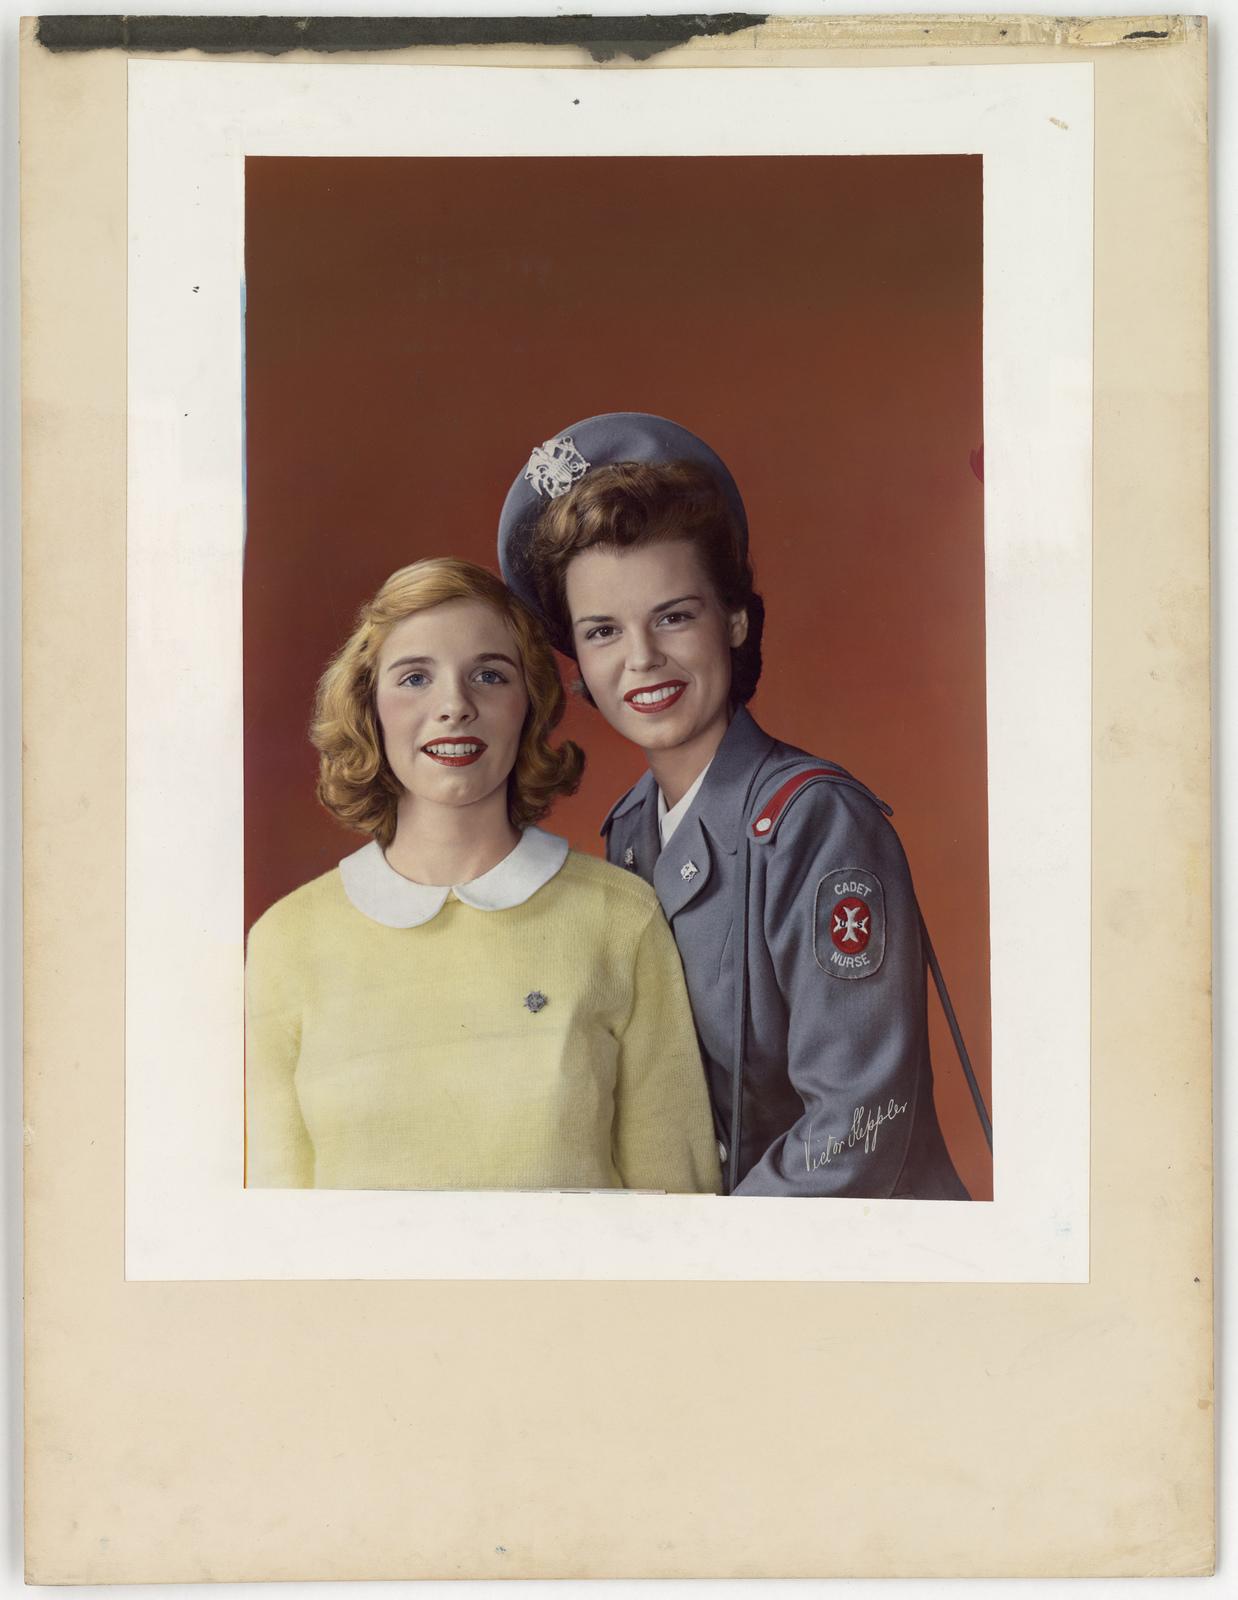 [Cadet Nurse with high school girl] [Victor Keppler]